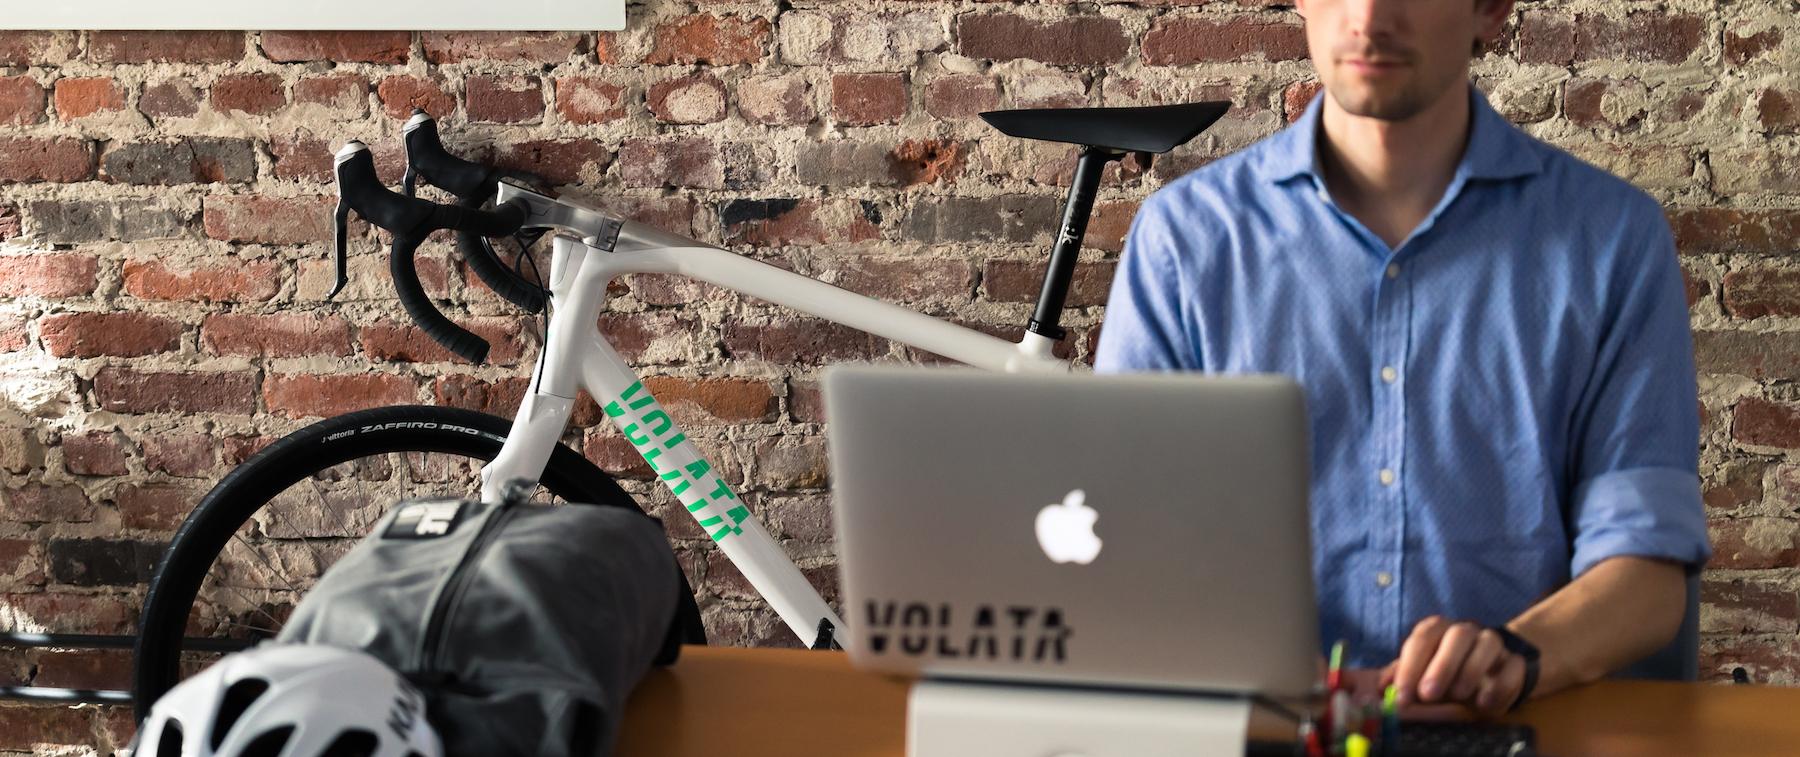 Volata Office Working_mediumres